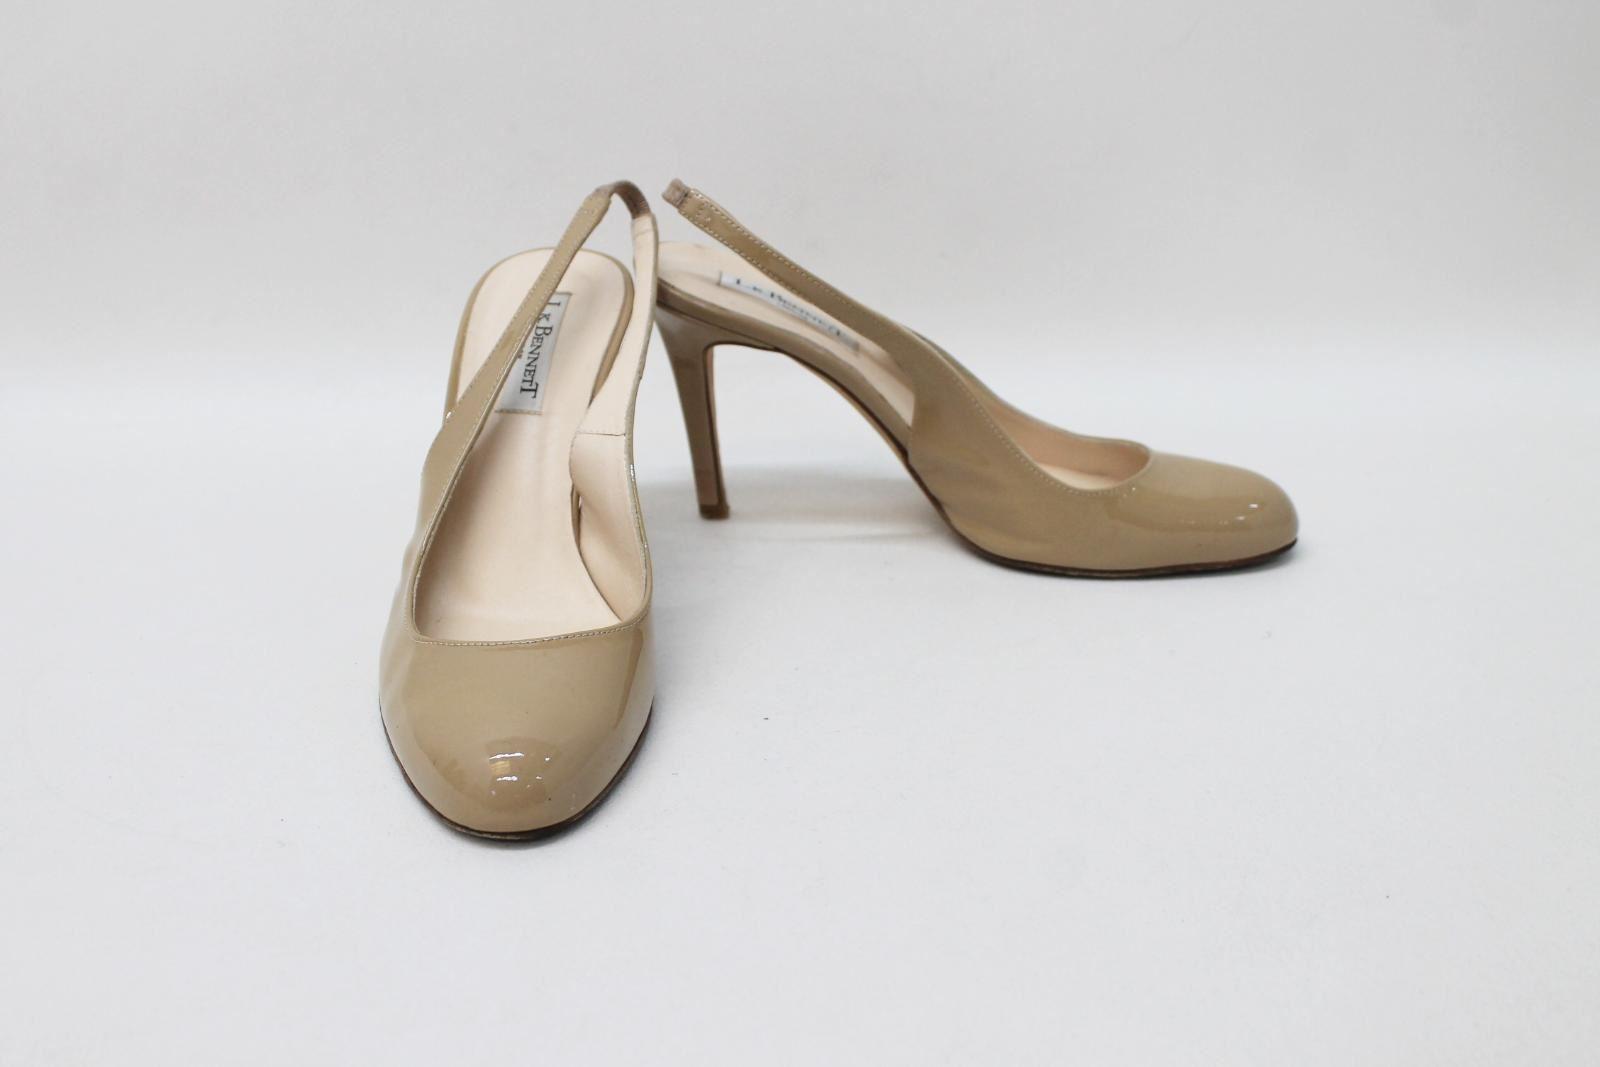 L.K.BENNETT Ladies Beige Patent Leather Sling backs shoes Size EU38.5 UK5.5